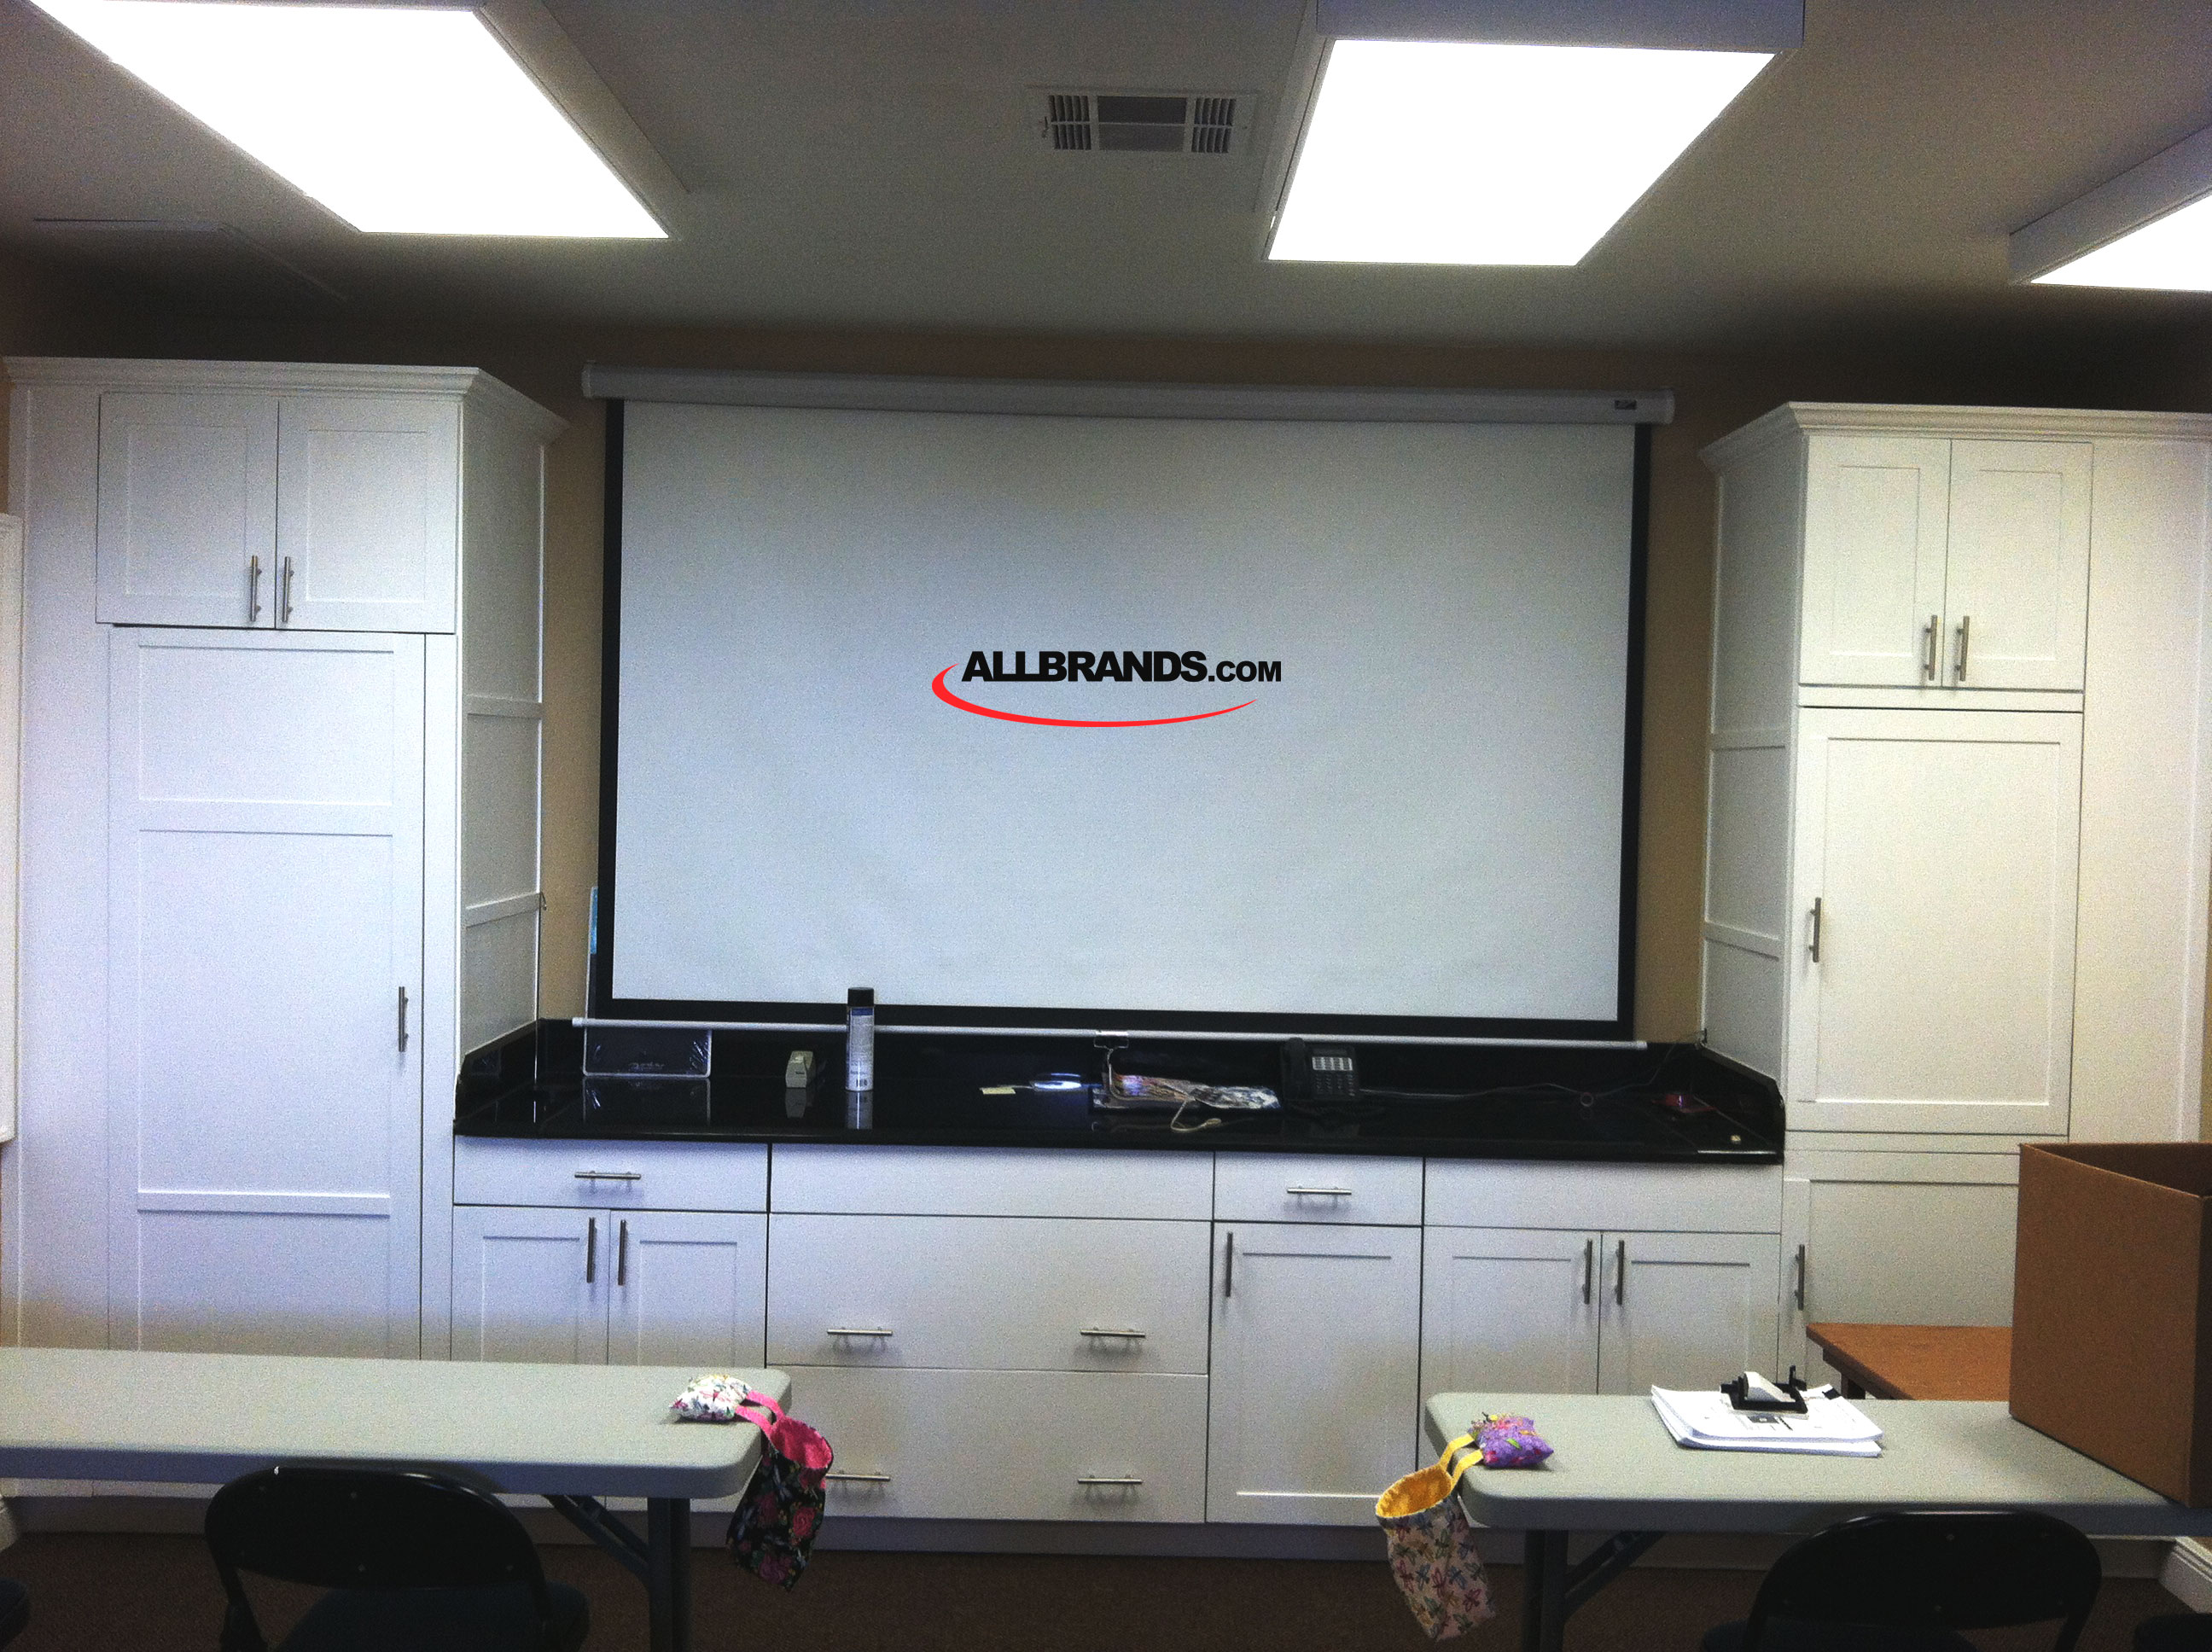 Allbrands Baton Rouge Classroom Renovations